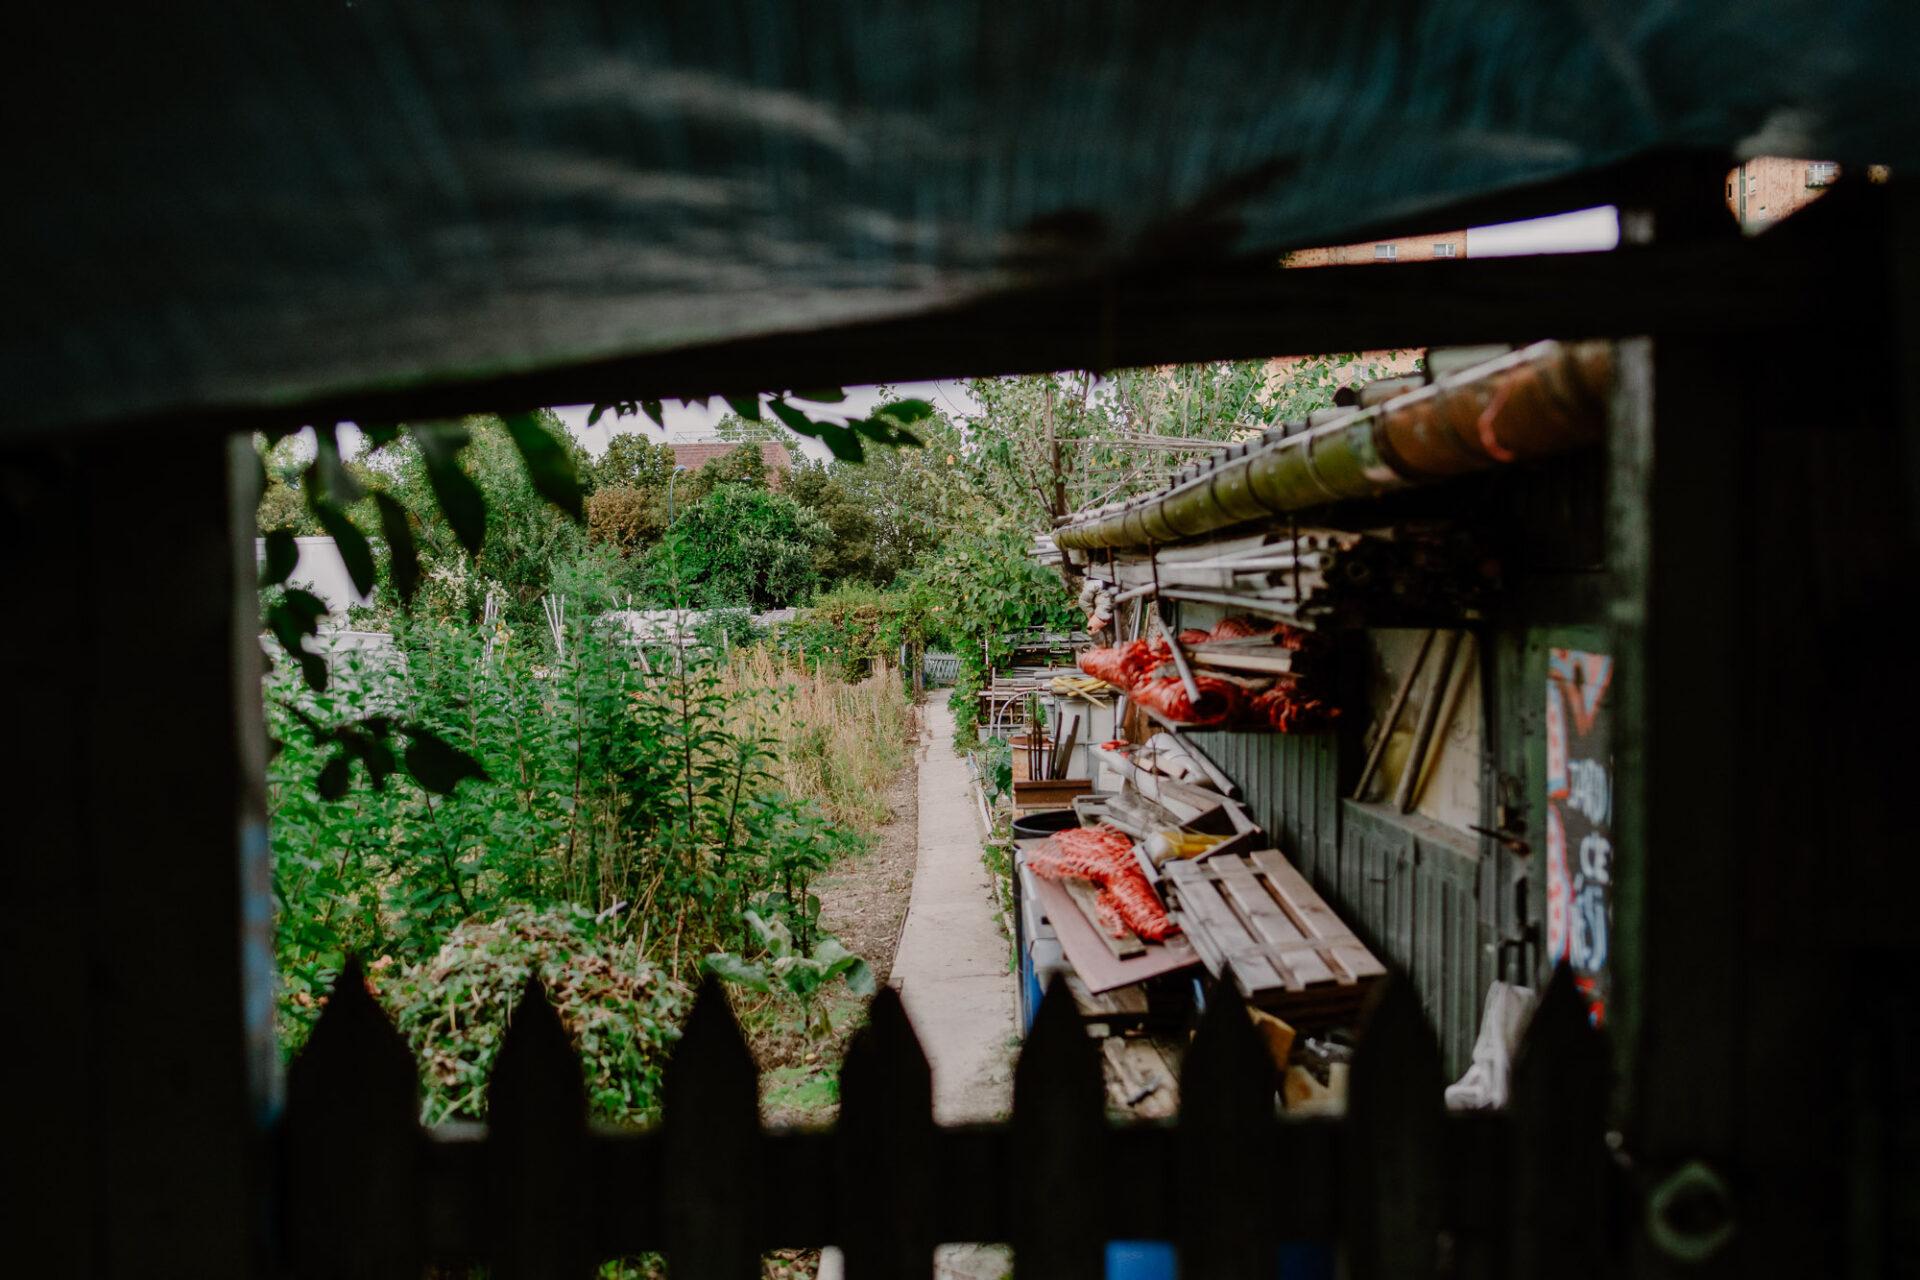 Jardins ouvriers aubervilliers 28 - Dagmara Bojenko - Eco-conscious Weddings, Births & Families